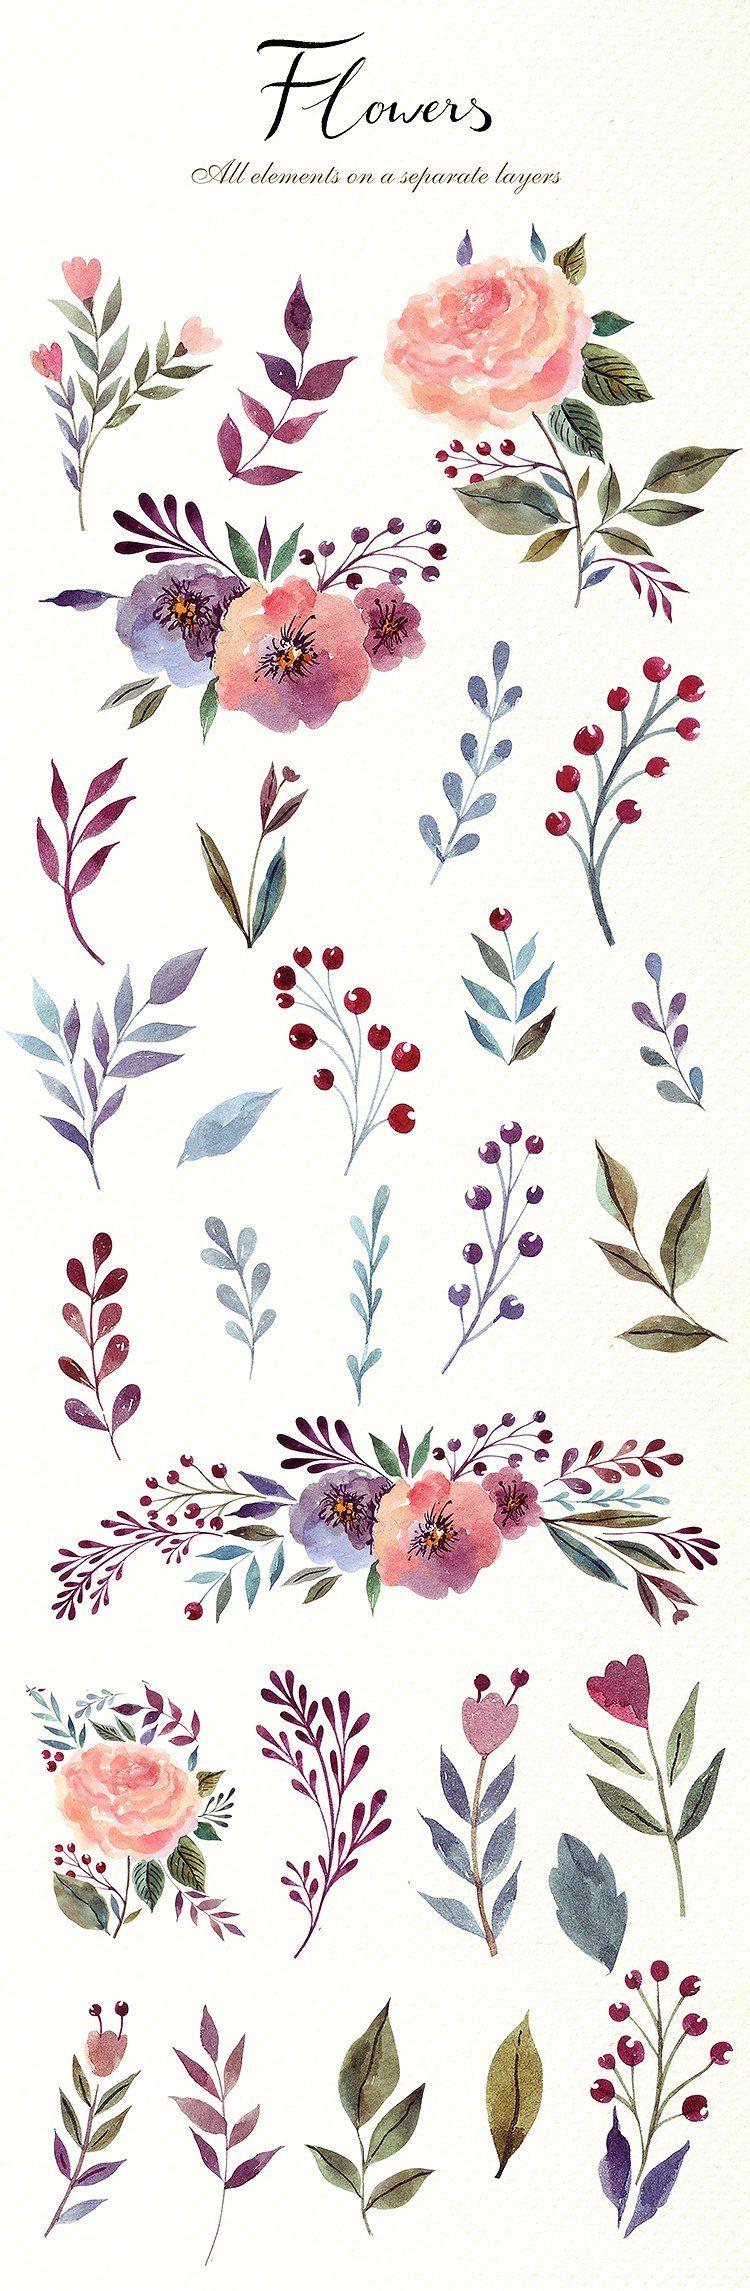 Photo of 230 watercolor graphic elements from MoleskoStudio on Creative Market